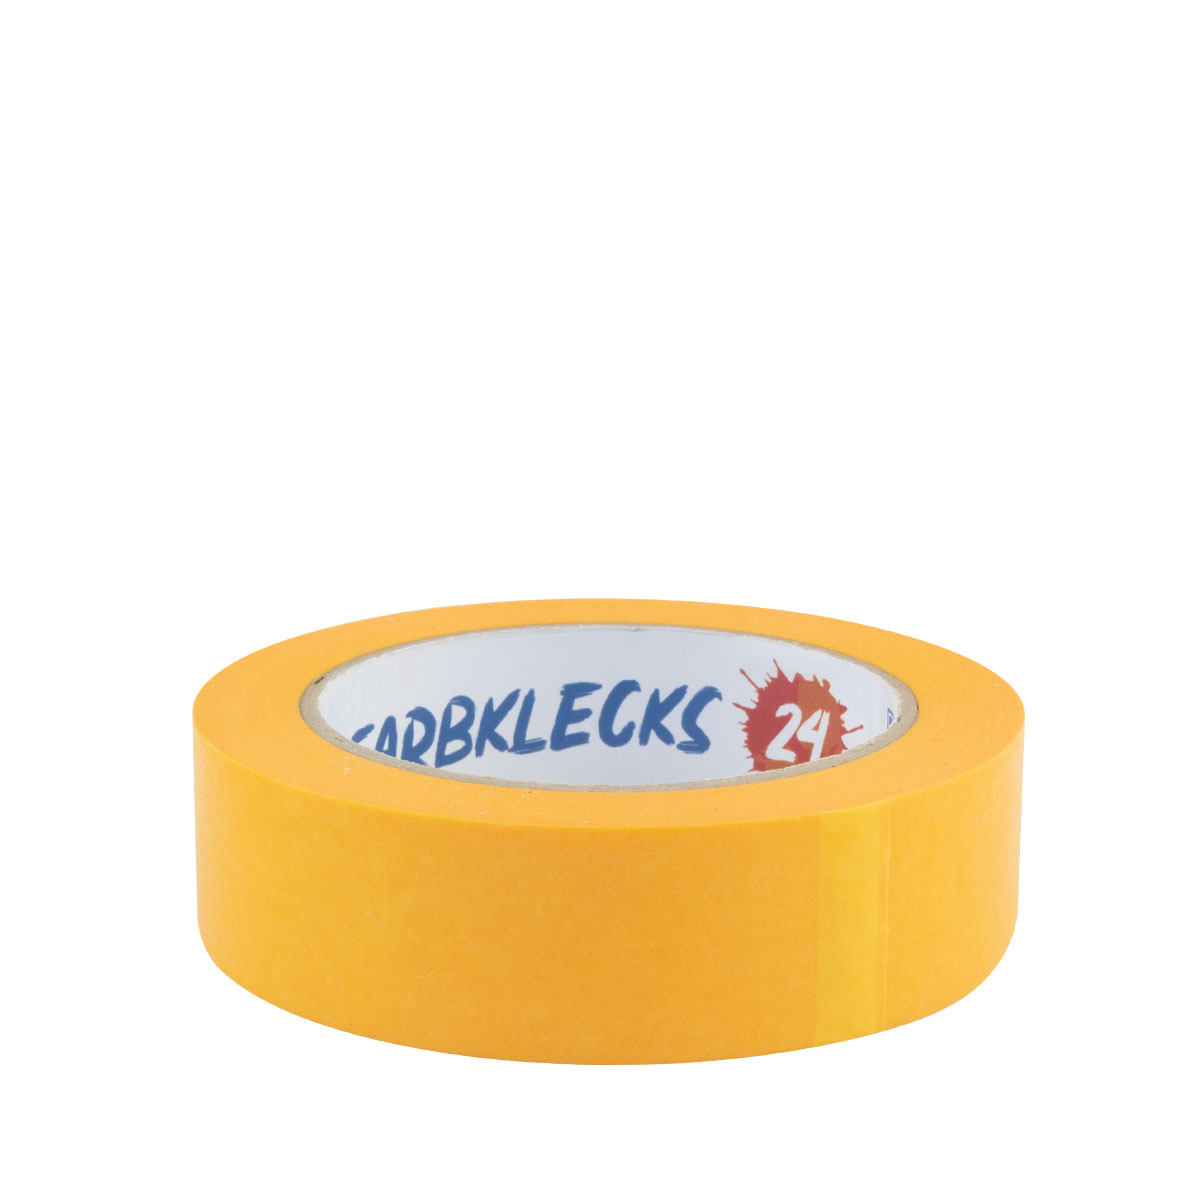 Farbklecks24 Klebeband Gold, Goldband 30mm